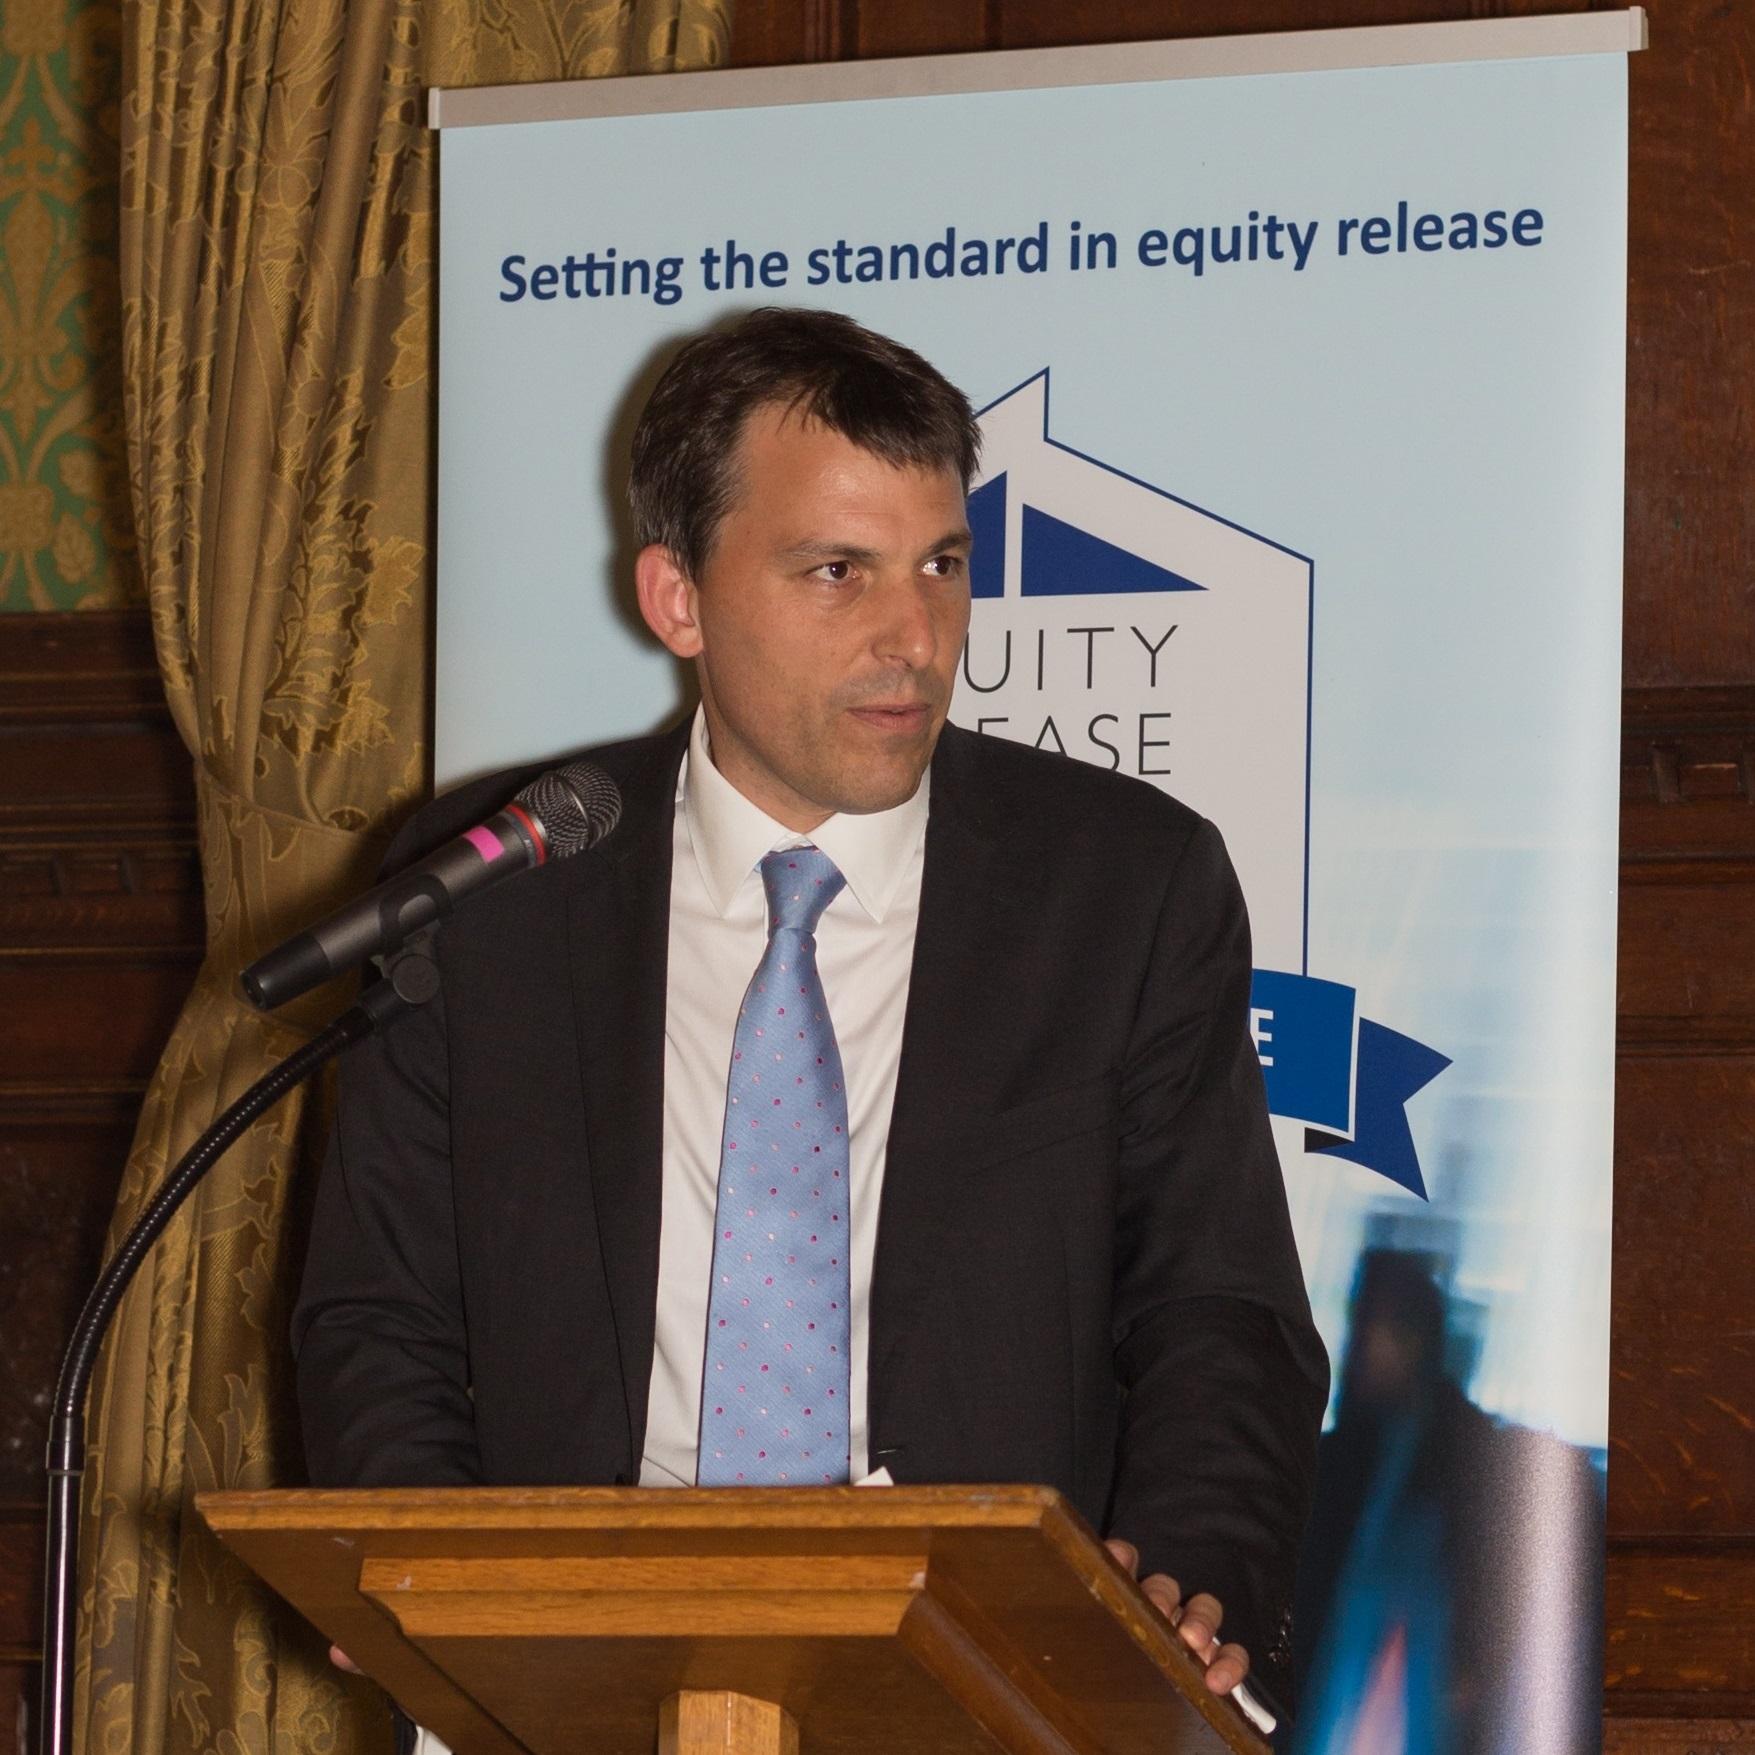 Economic Secretary to Treasury confirmed for landmark equity release event